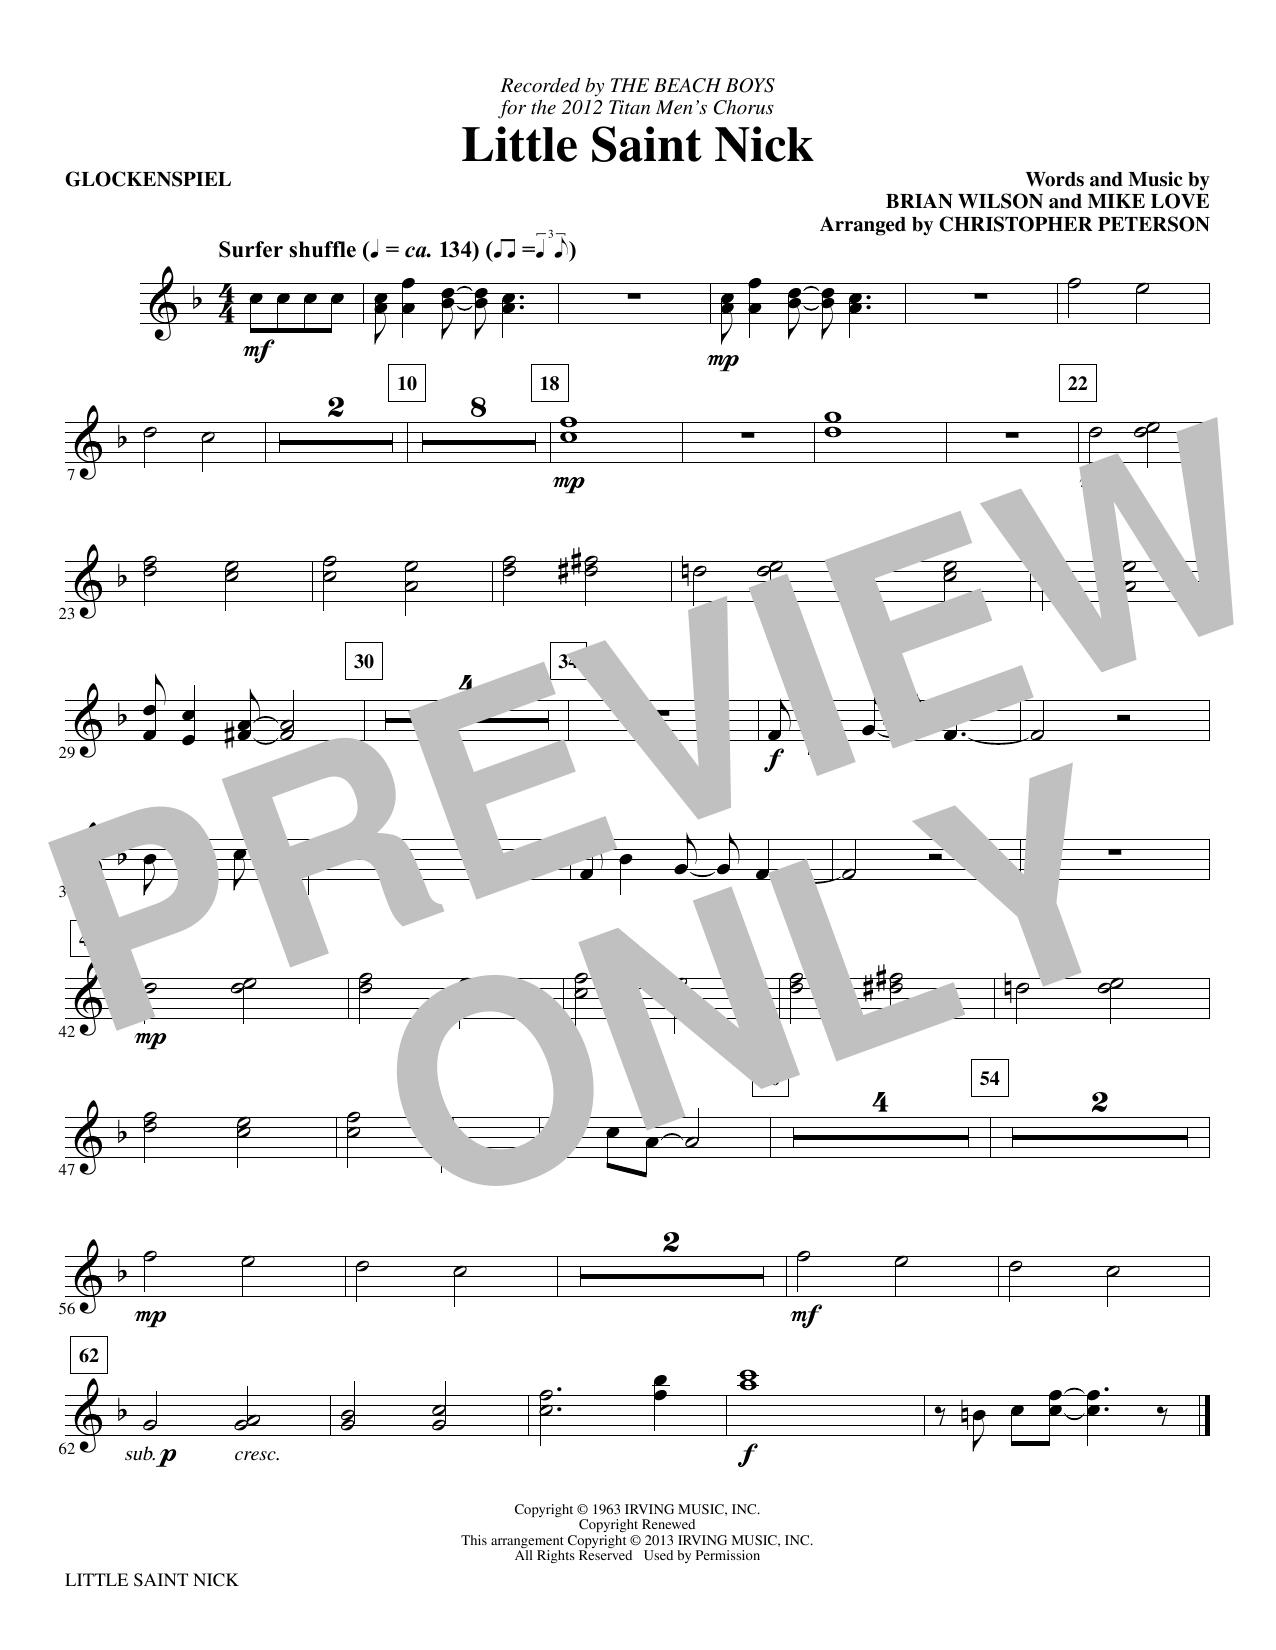 Little Saint Nick - Glockenspiel sheet music